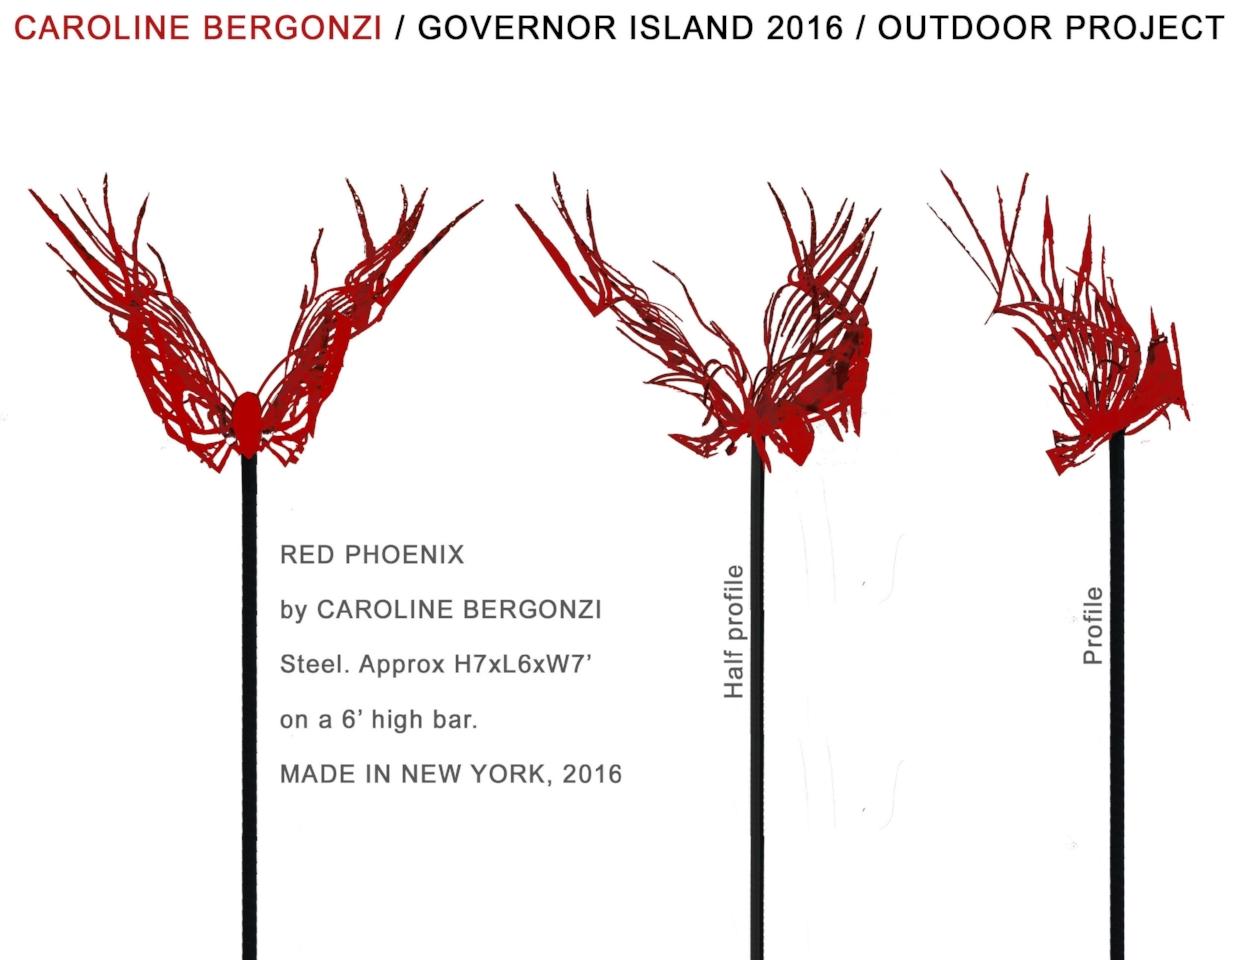 bergonzi-gov-island-page1-views.jpg